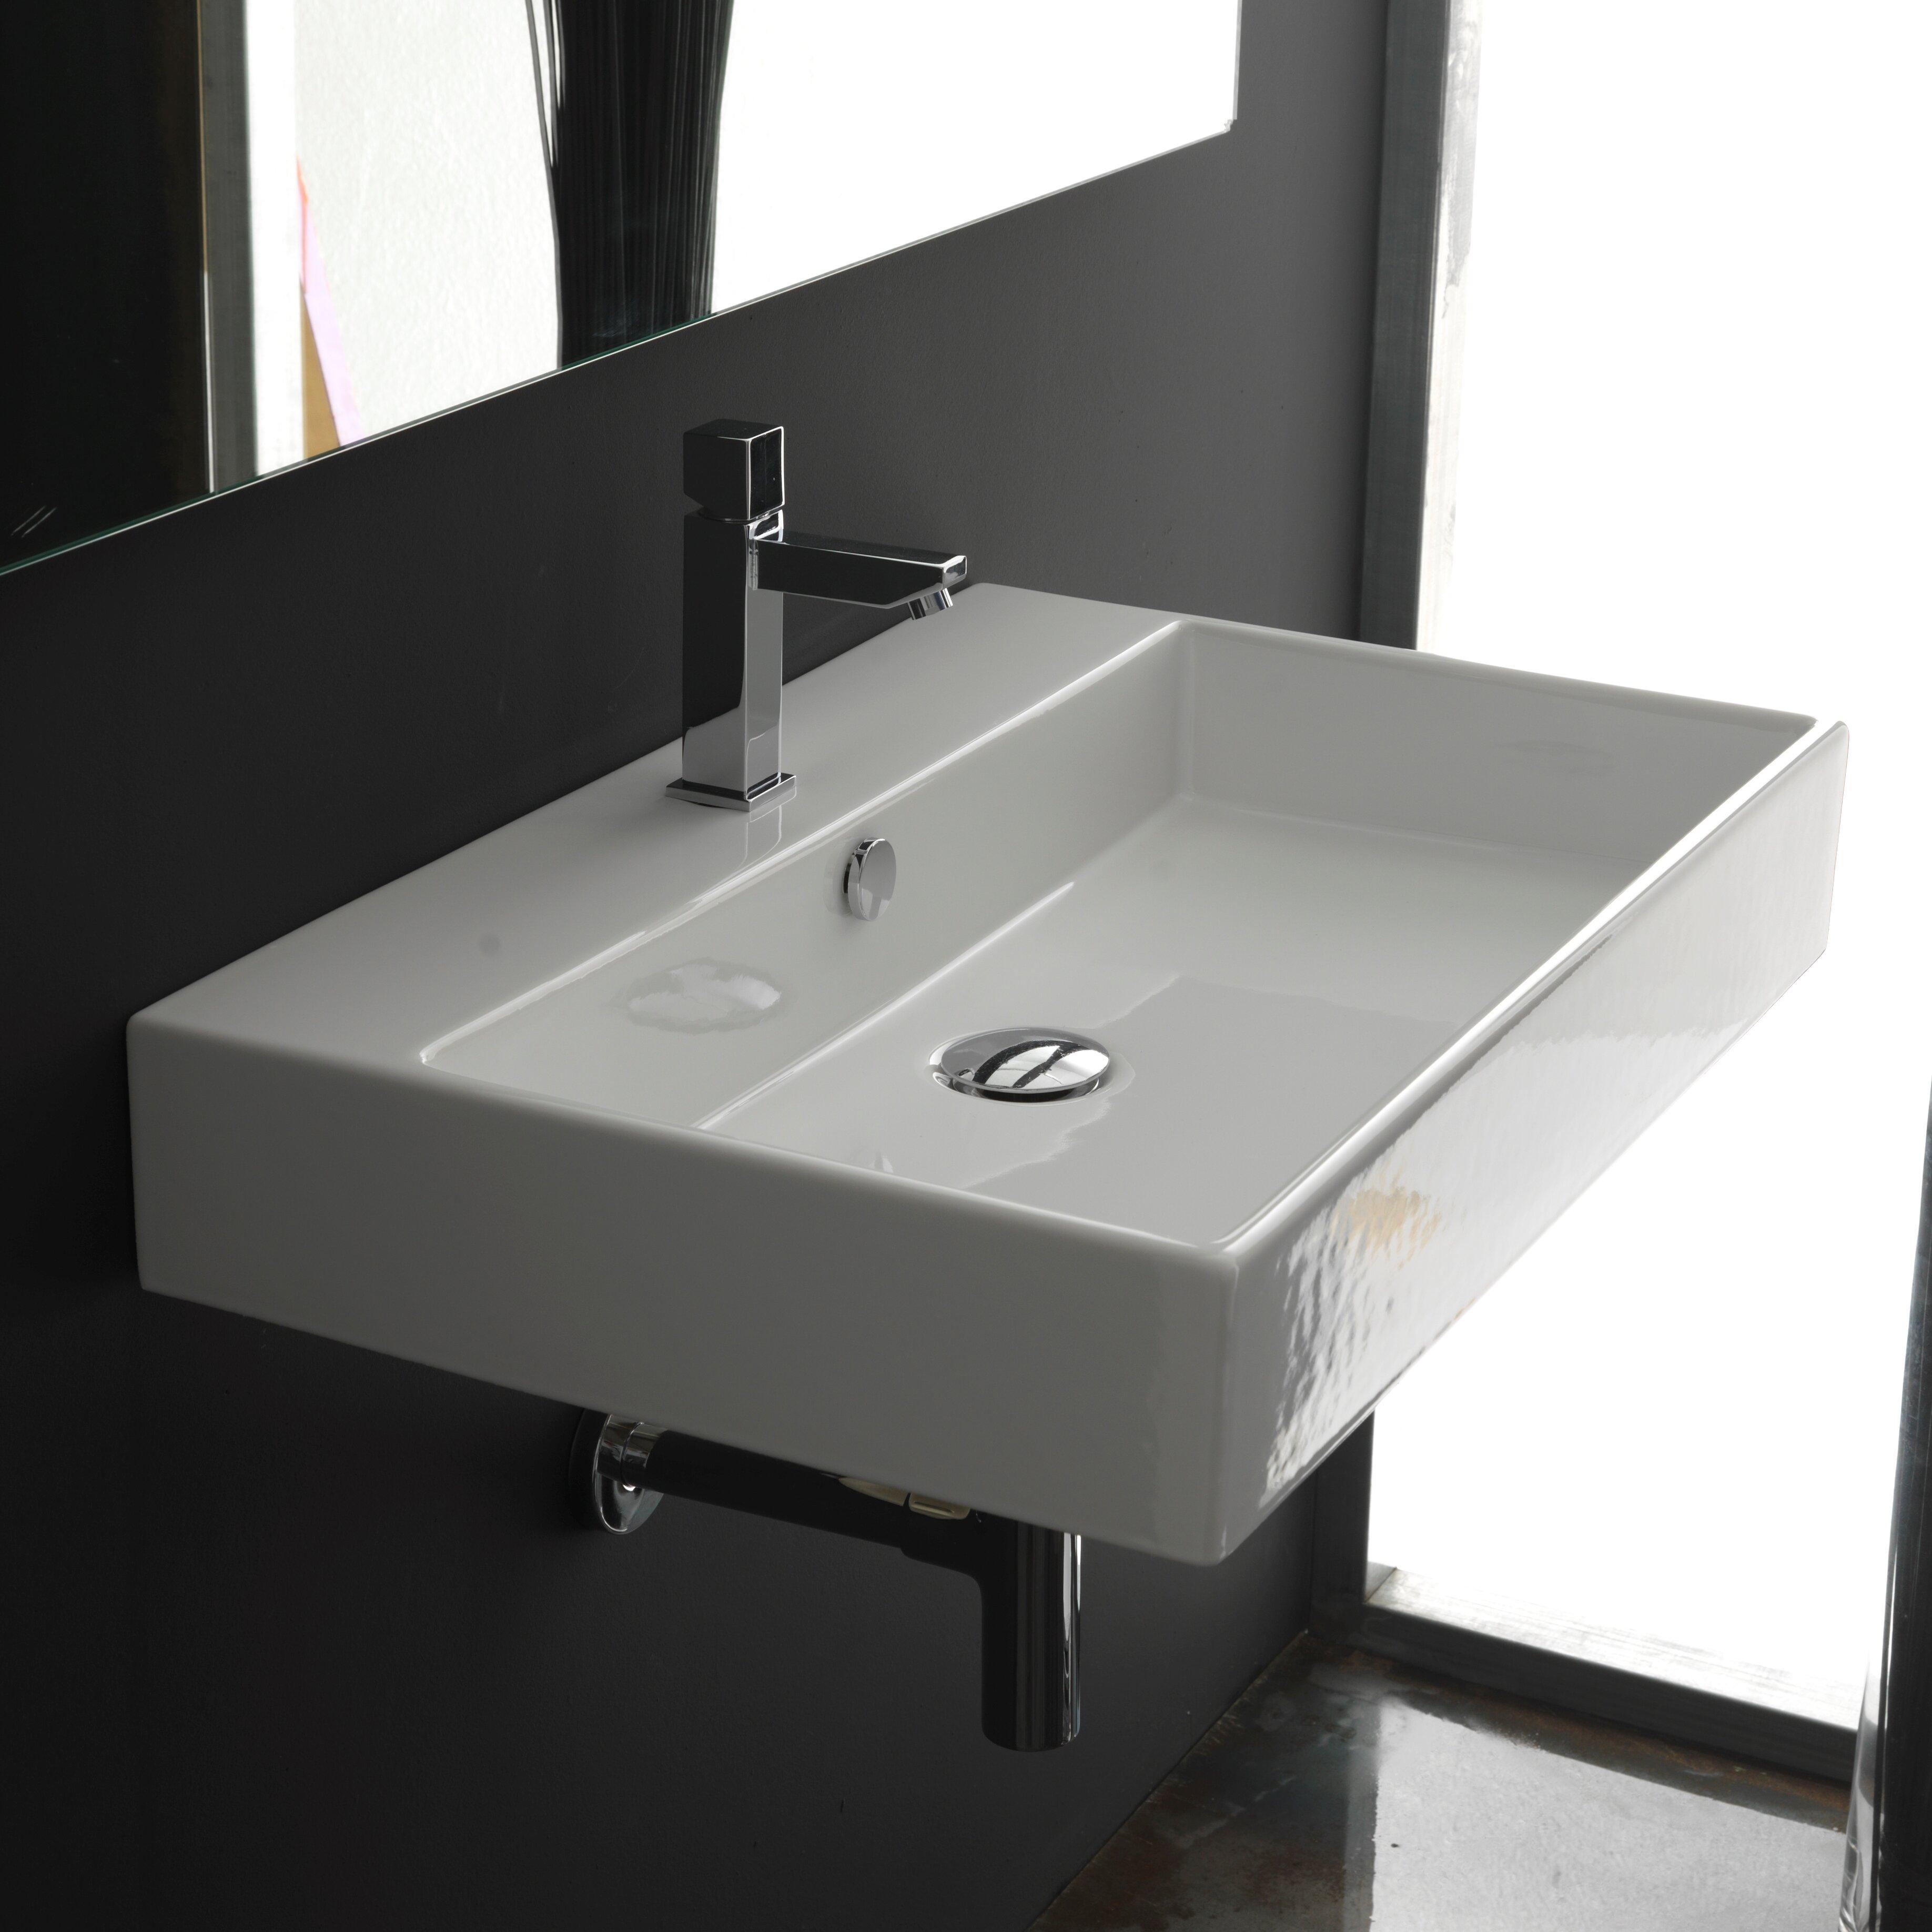 Bathroom Sink Material Ws Bath Collections Ceramica Ii Unlimited Ceramic Bathroom Sink